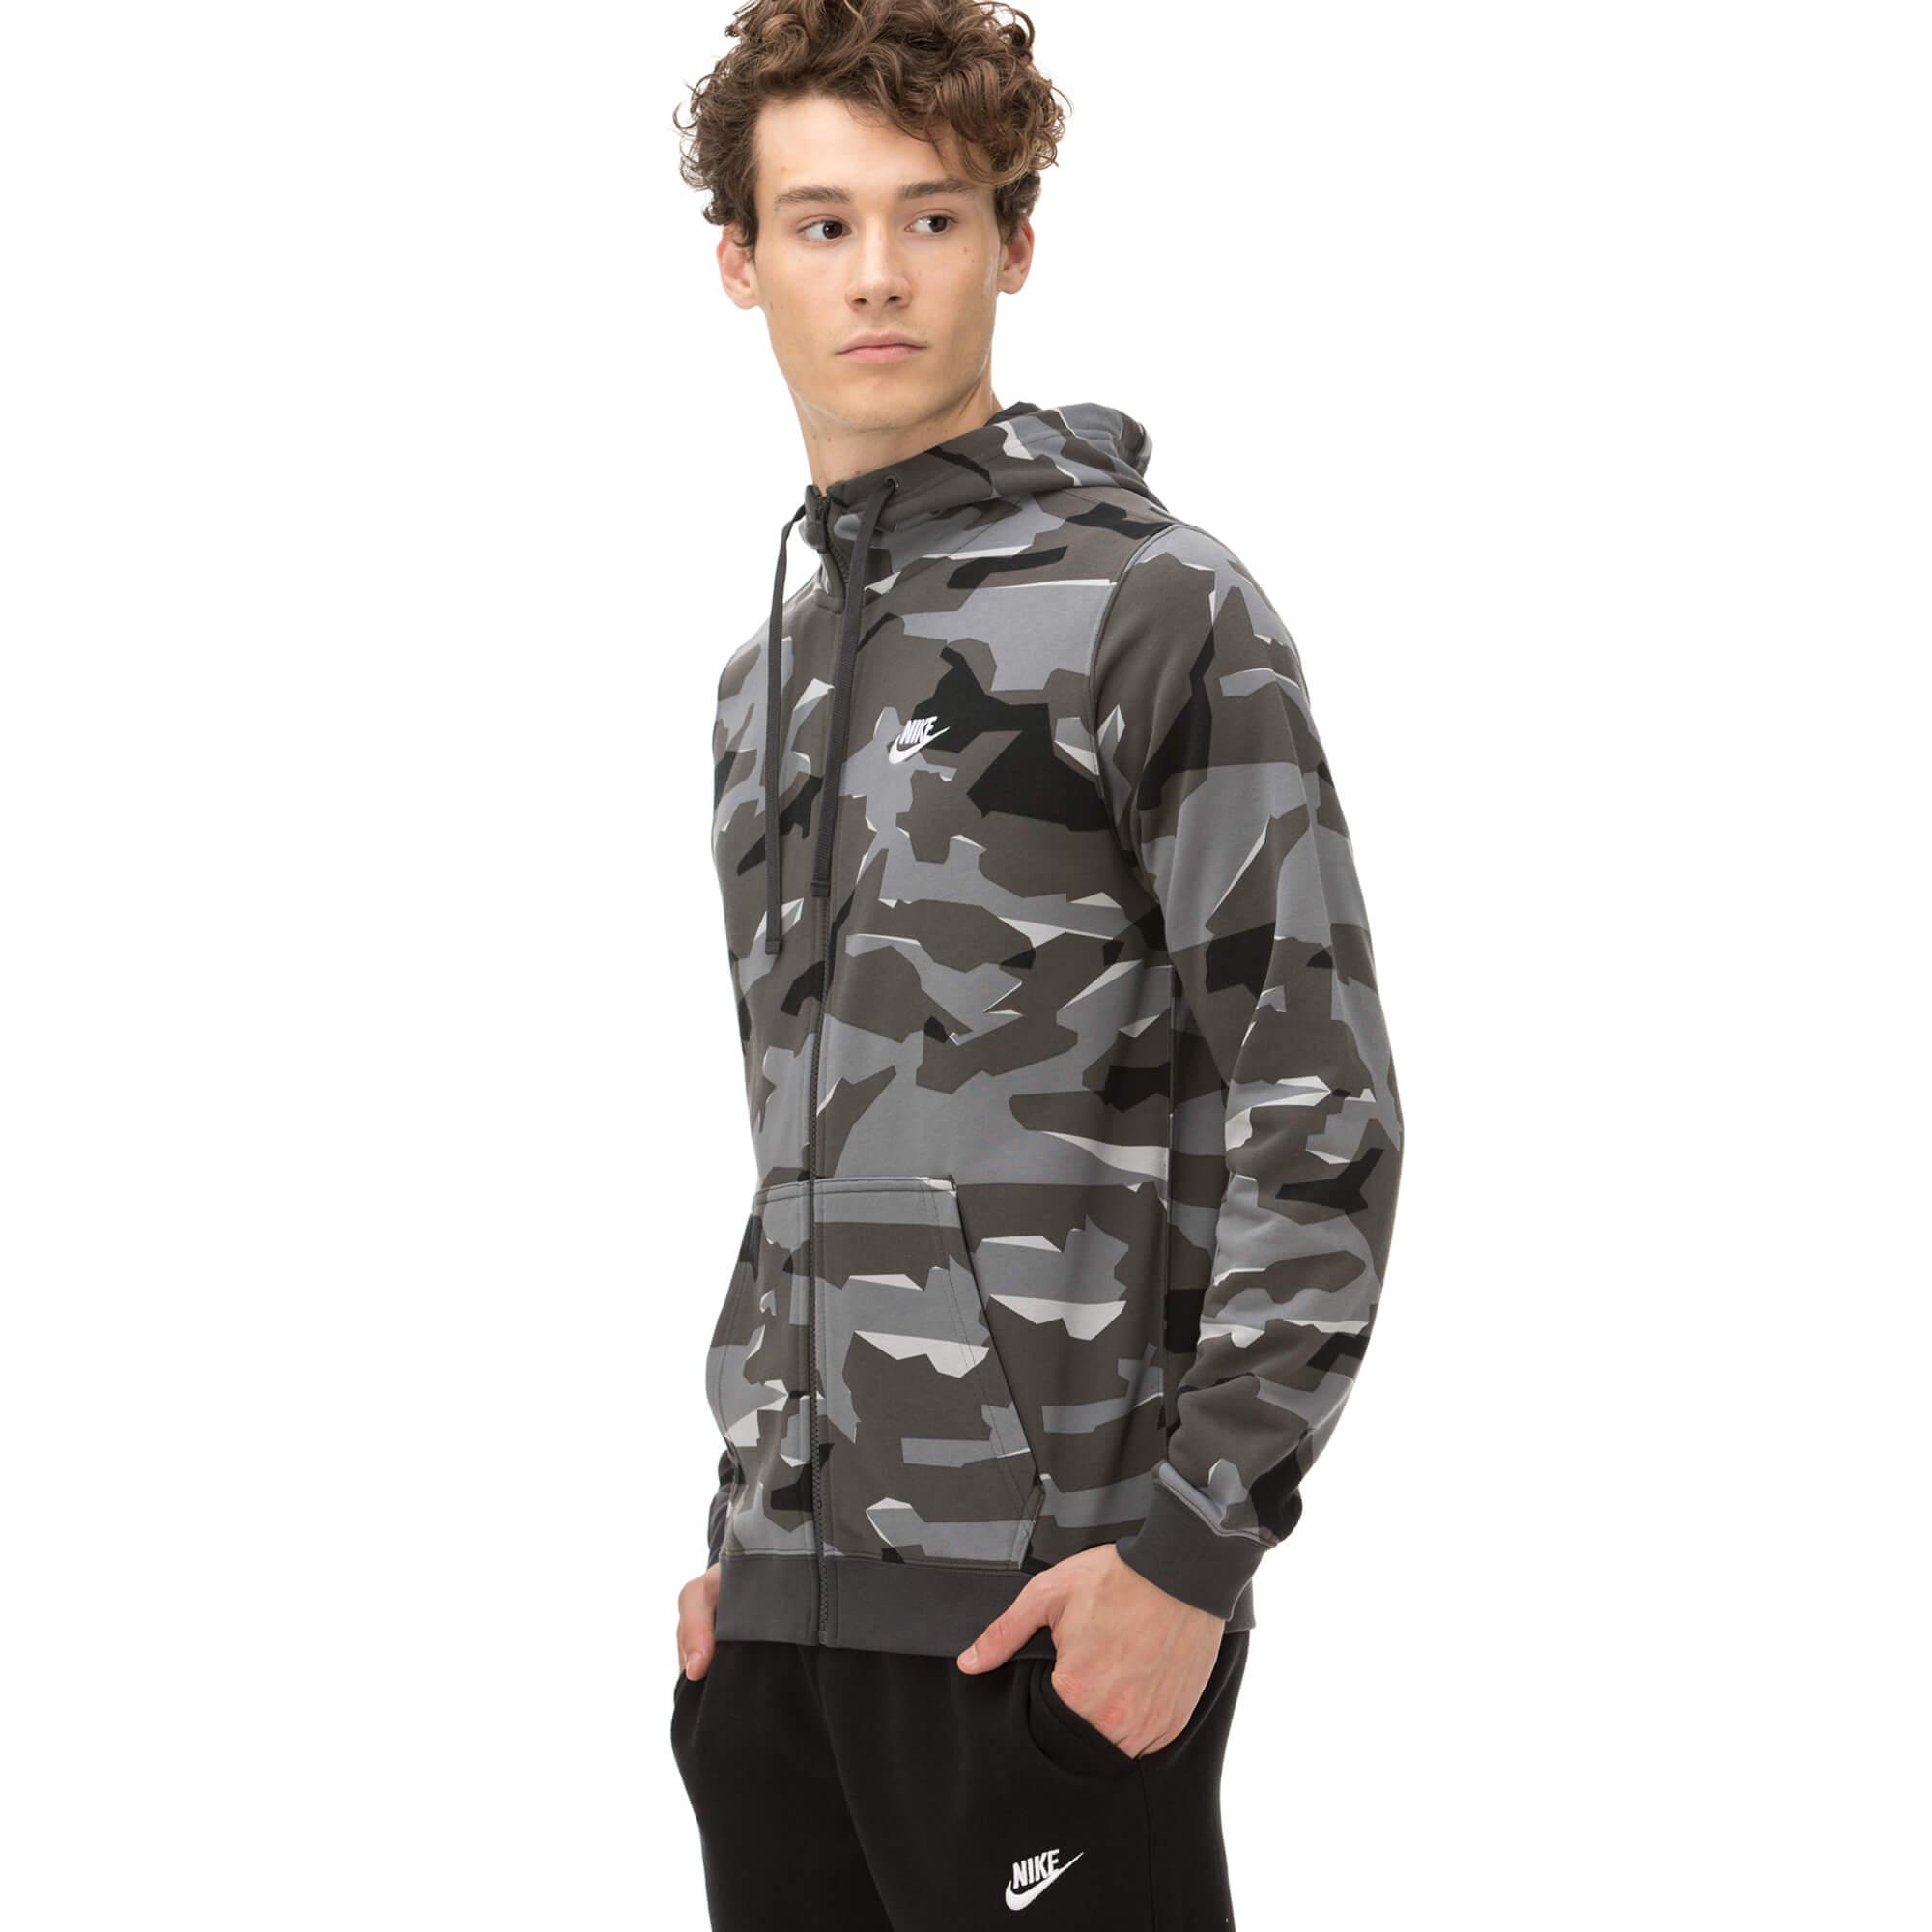 Nike Erkek Kamuflaj Gri Sweatshirt